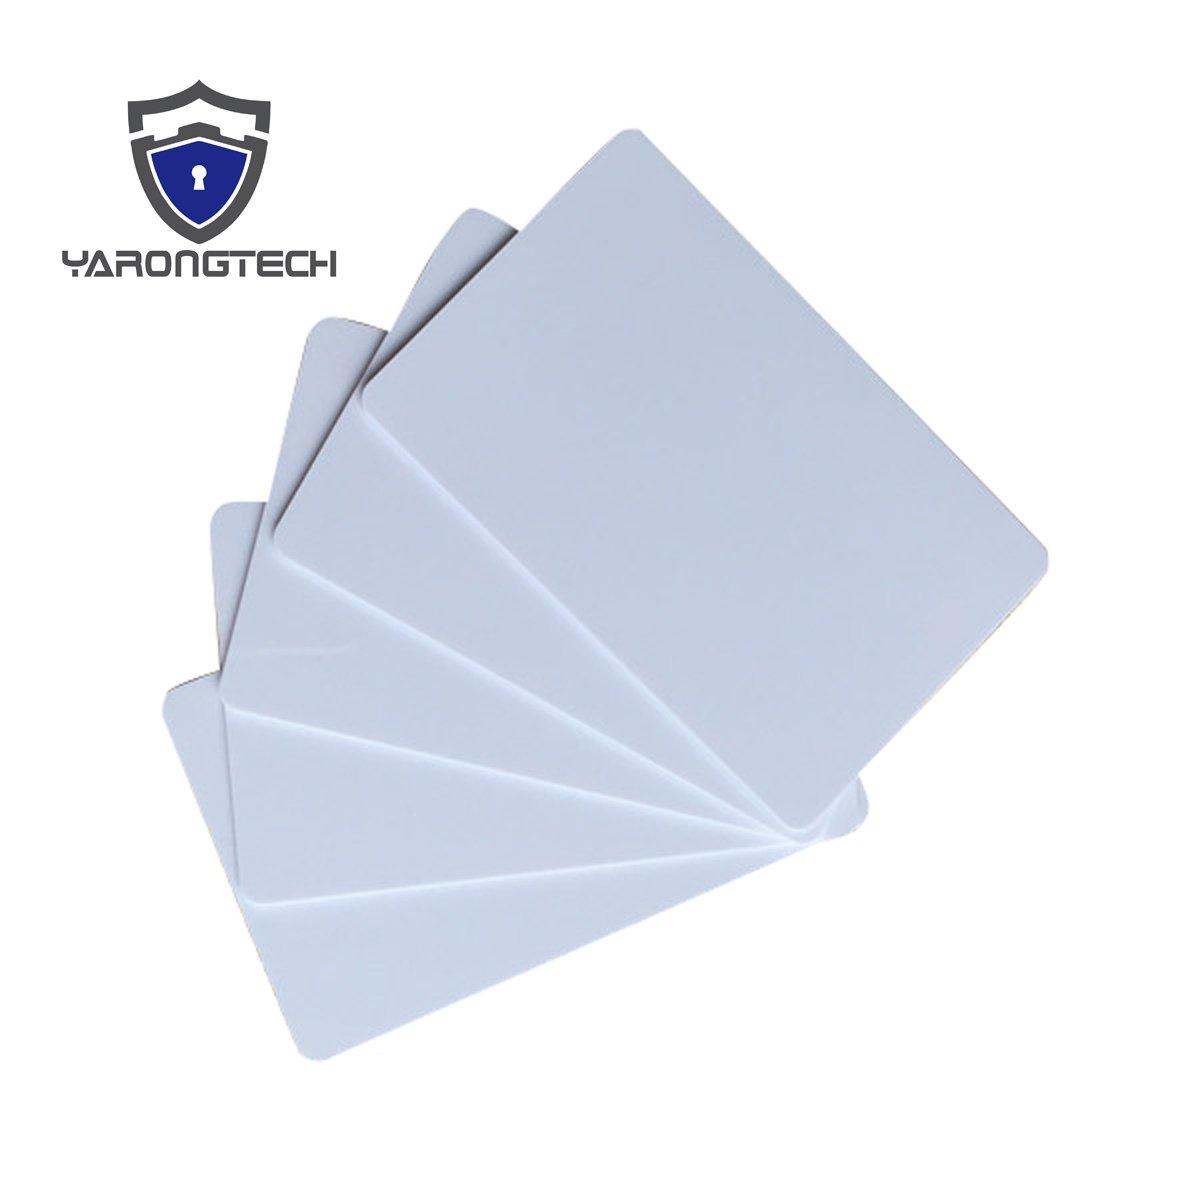 Amazon.com: yarongtech Mifare DESFire EV1 2 K NFC Tarjeta ...